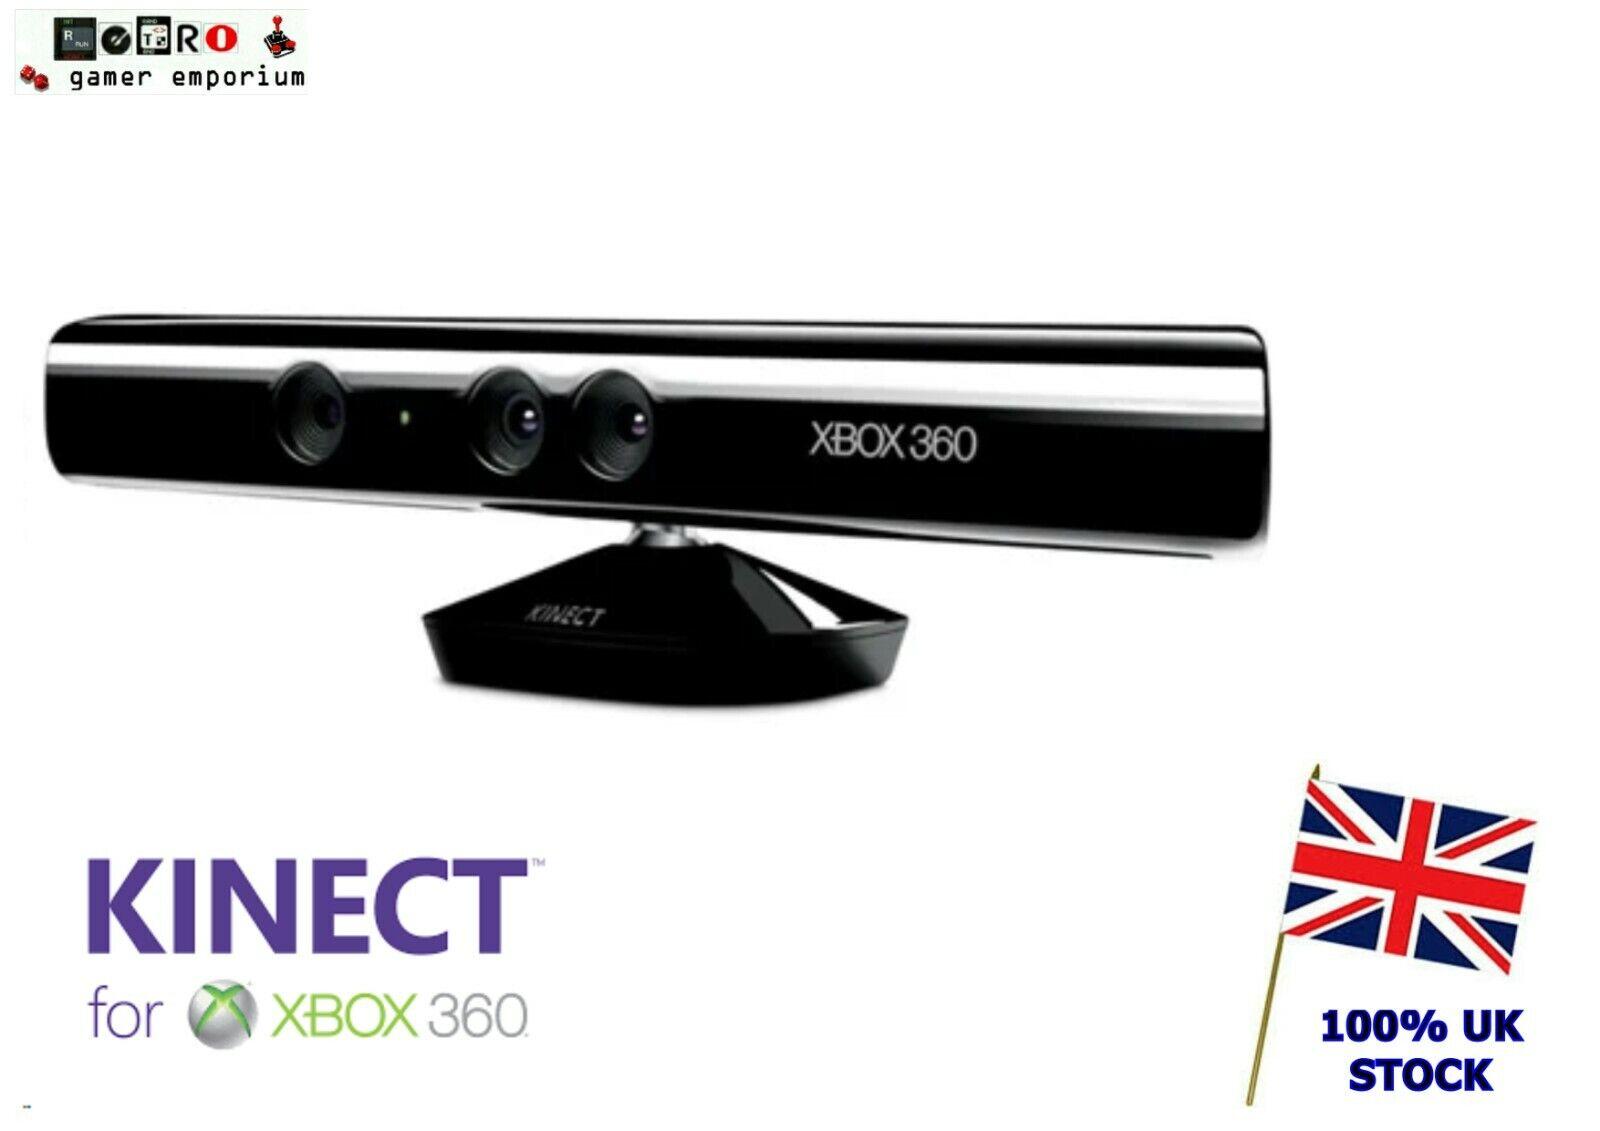 Xbox 360 Kinect Sensor - Fully Tested - FAST DISPATCH - MIcrosoft